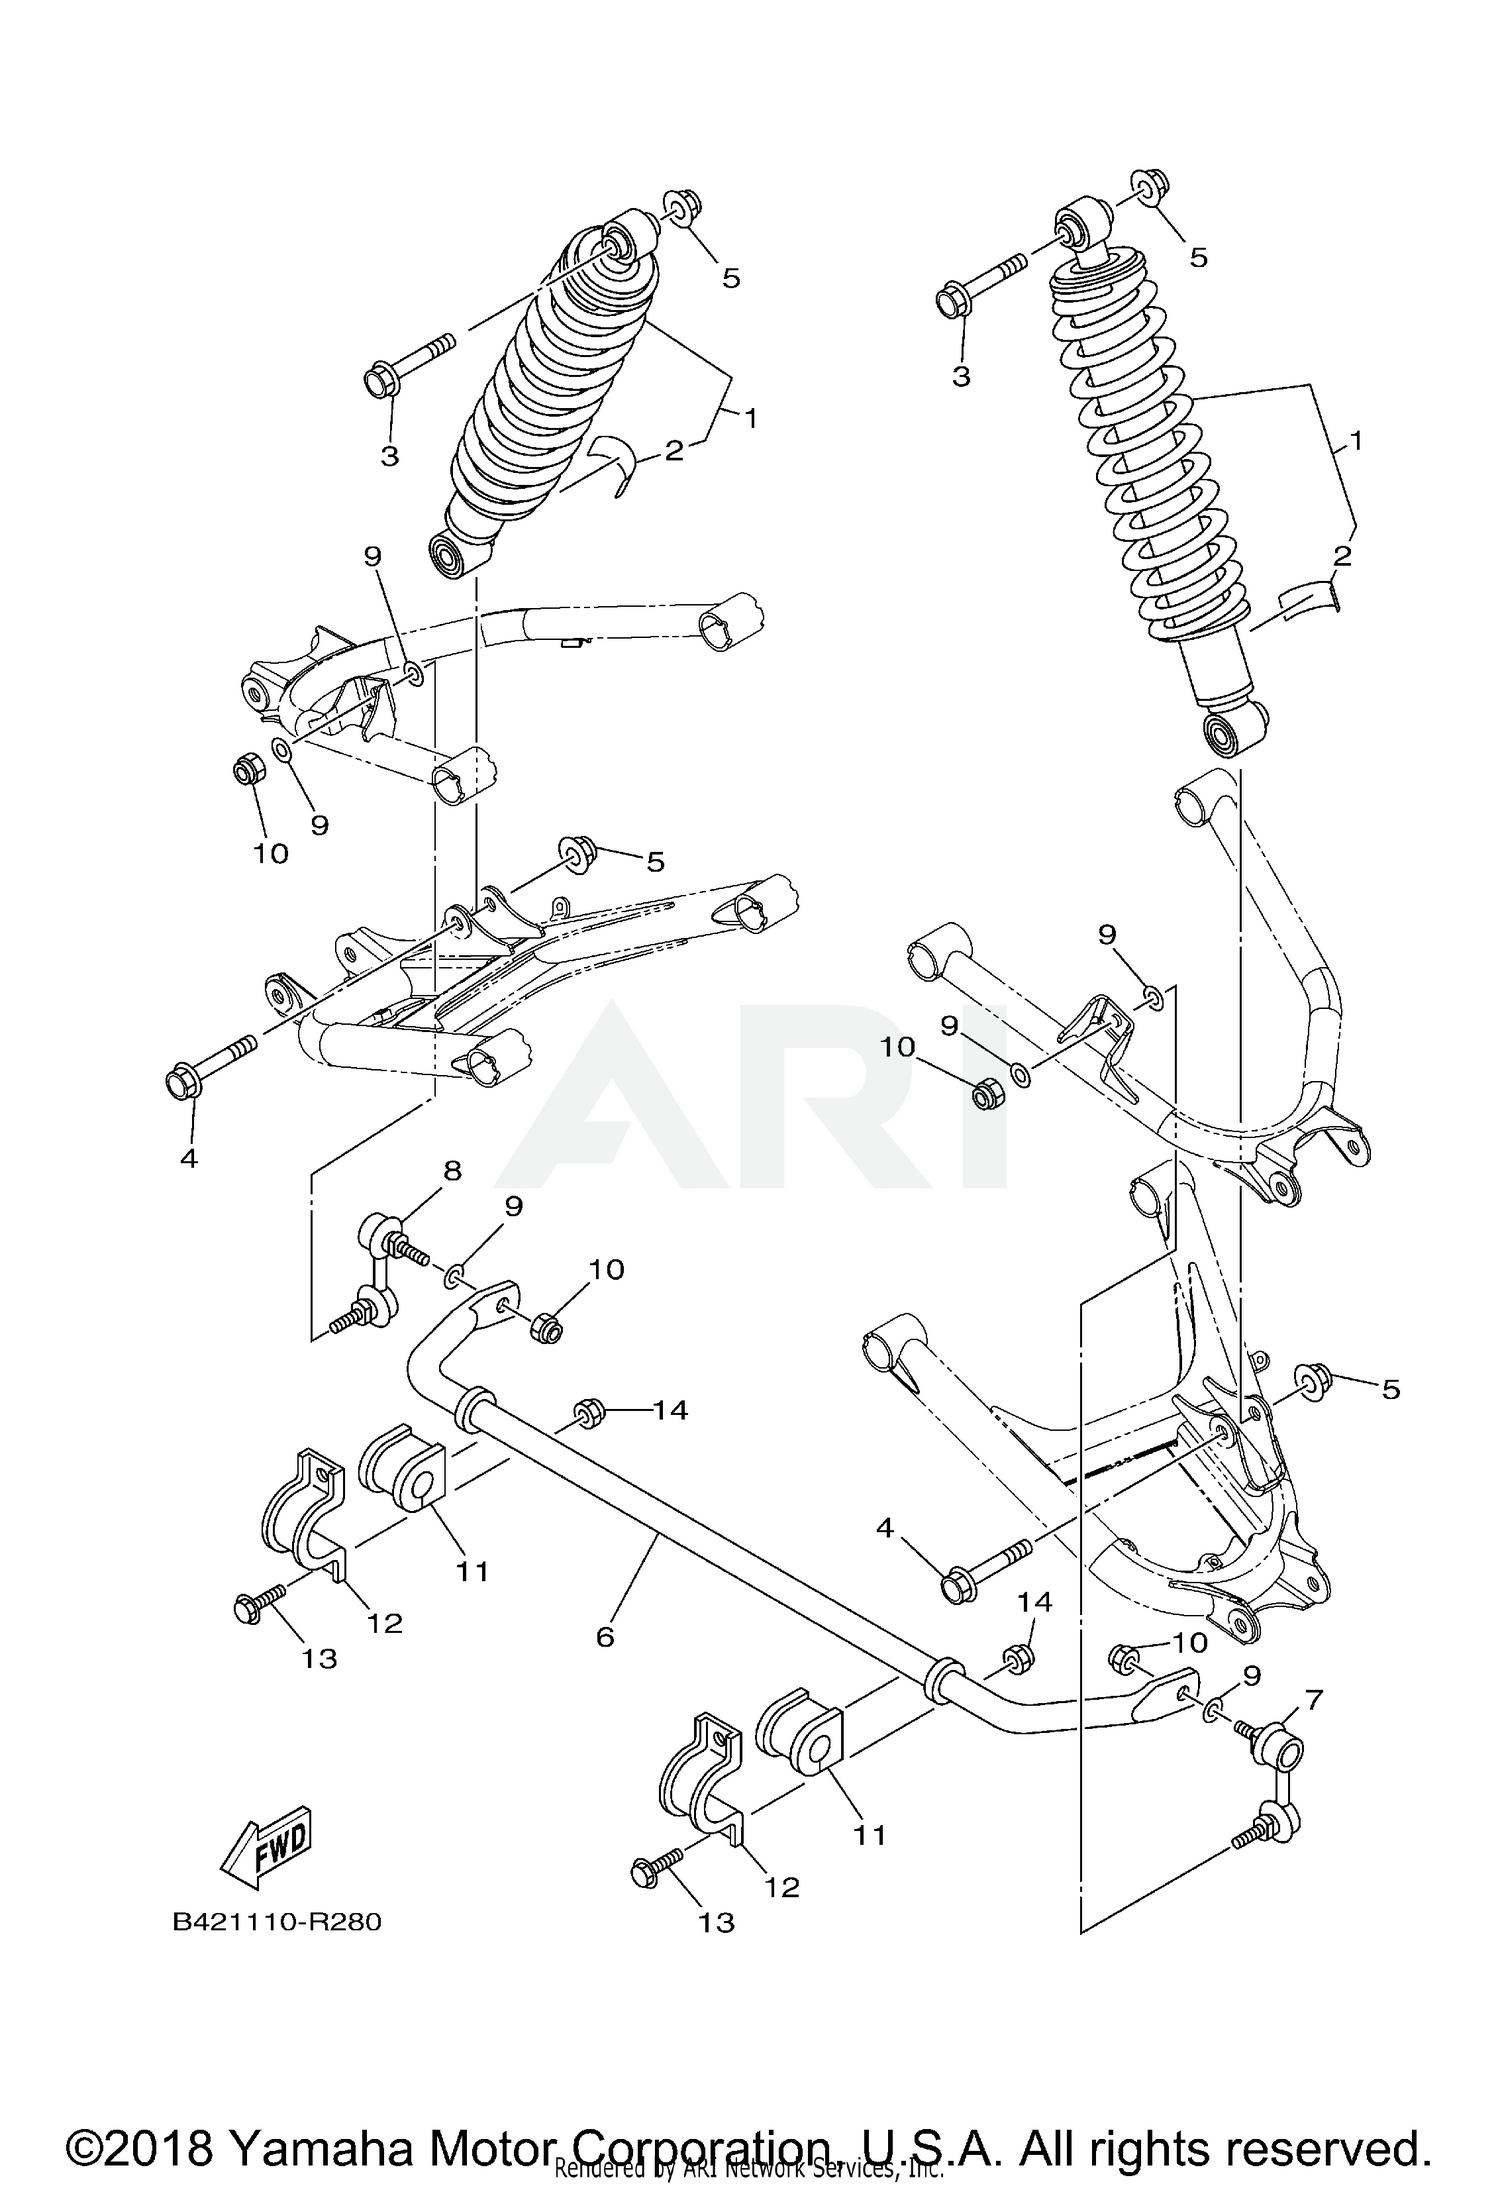 2018 Yamaha Viking VI EPS - YXC70VPXJG REAR SUSPENSION Parts